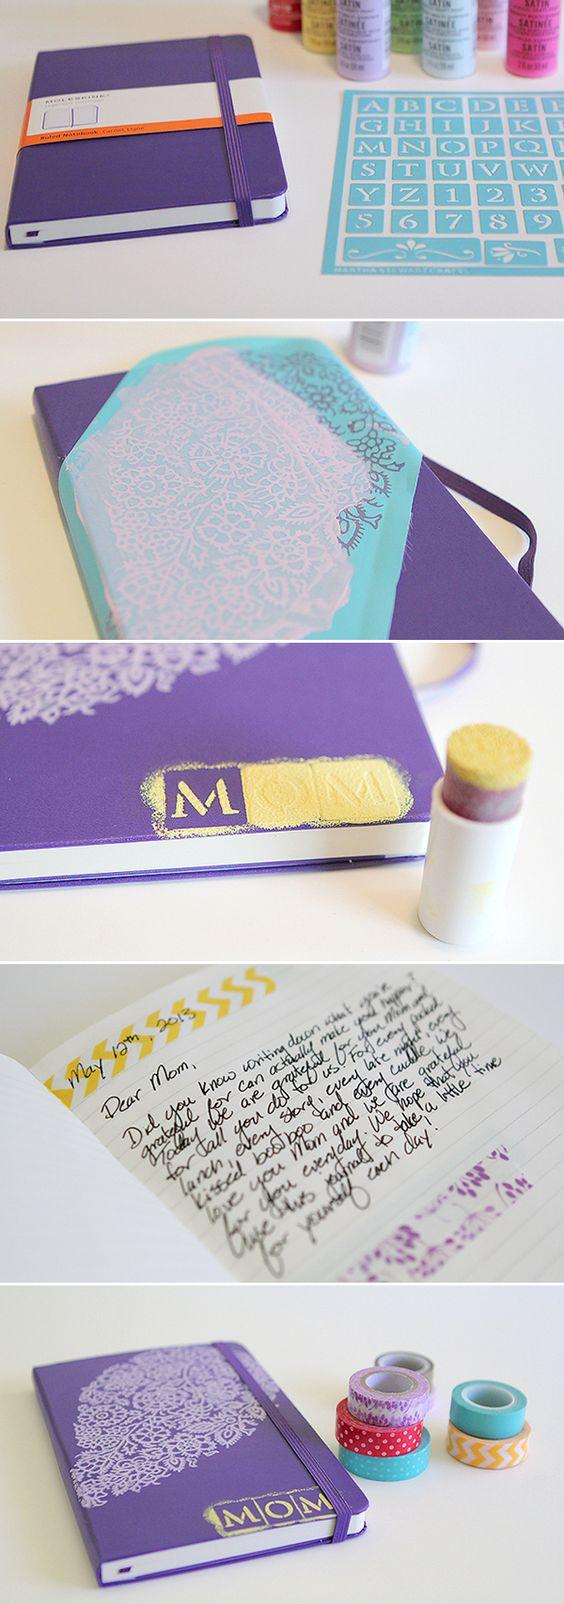 Mother's Day DIY Gratitude Journal Journal entries